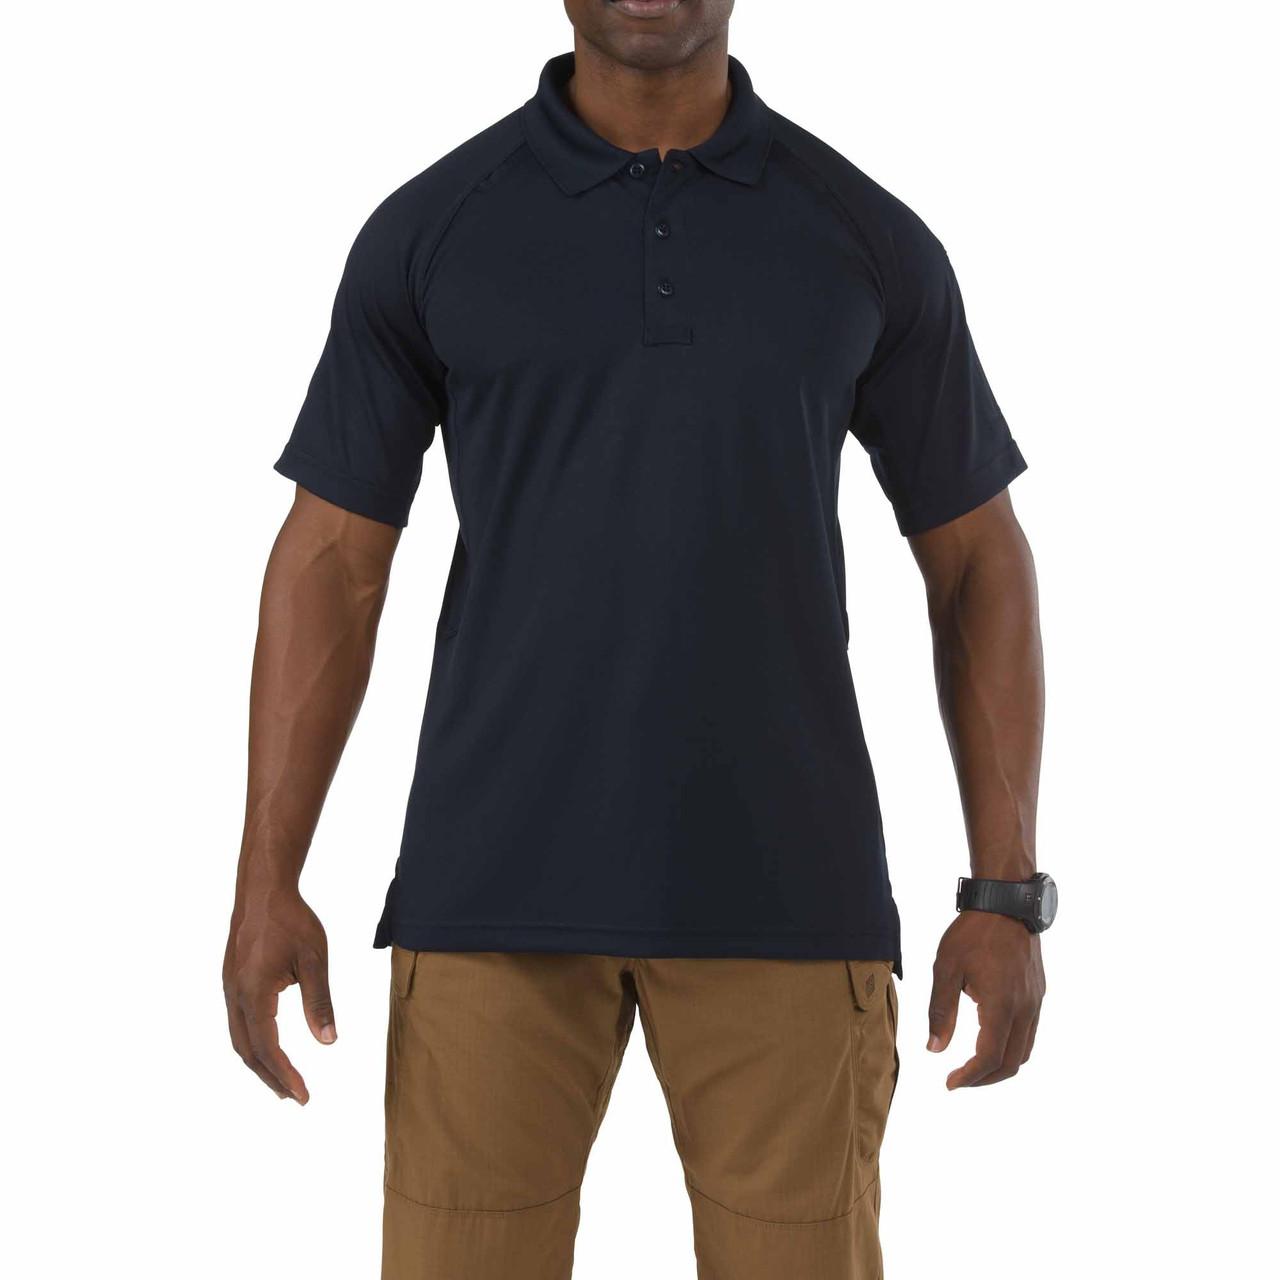 "Футболка Поло тактична з коротким рукавом ""Performance Polo - Short Sleeve, Synthetic Knit"""